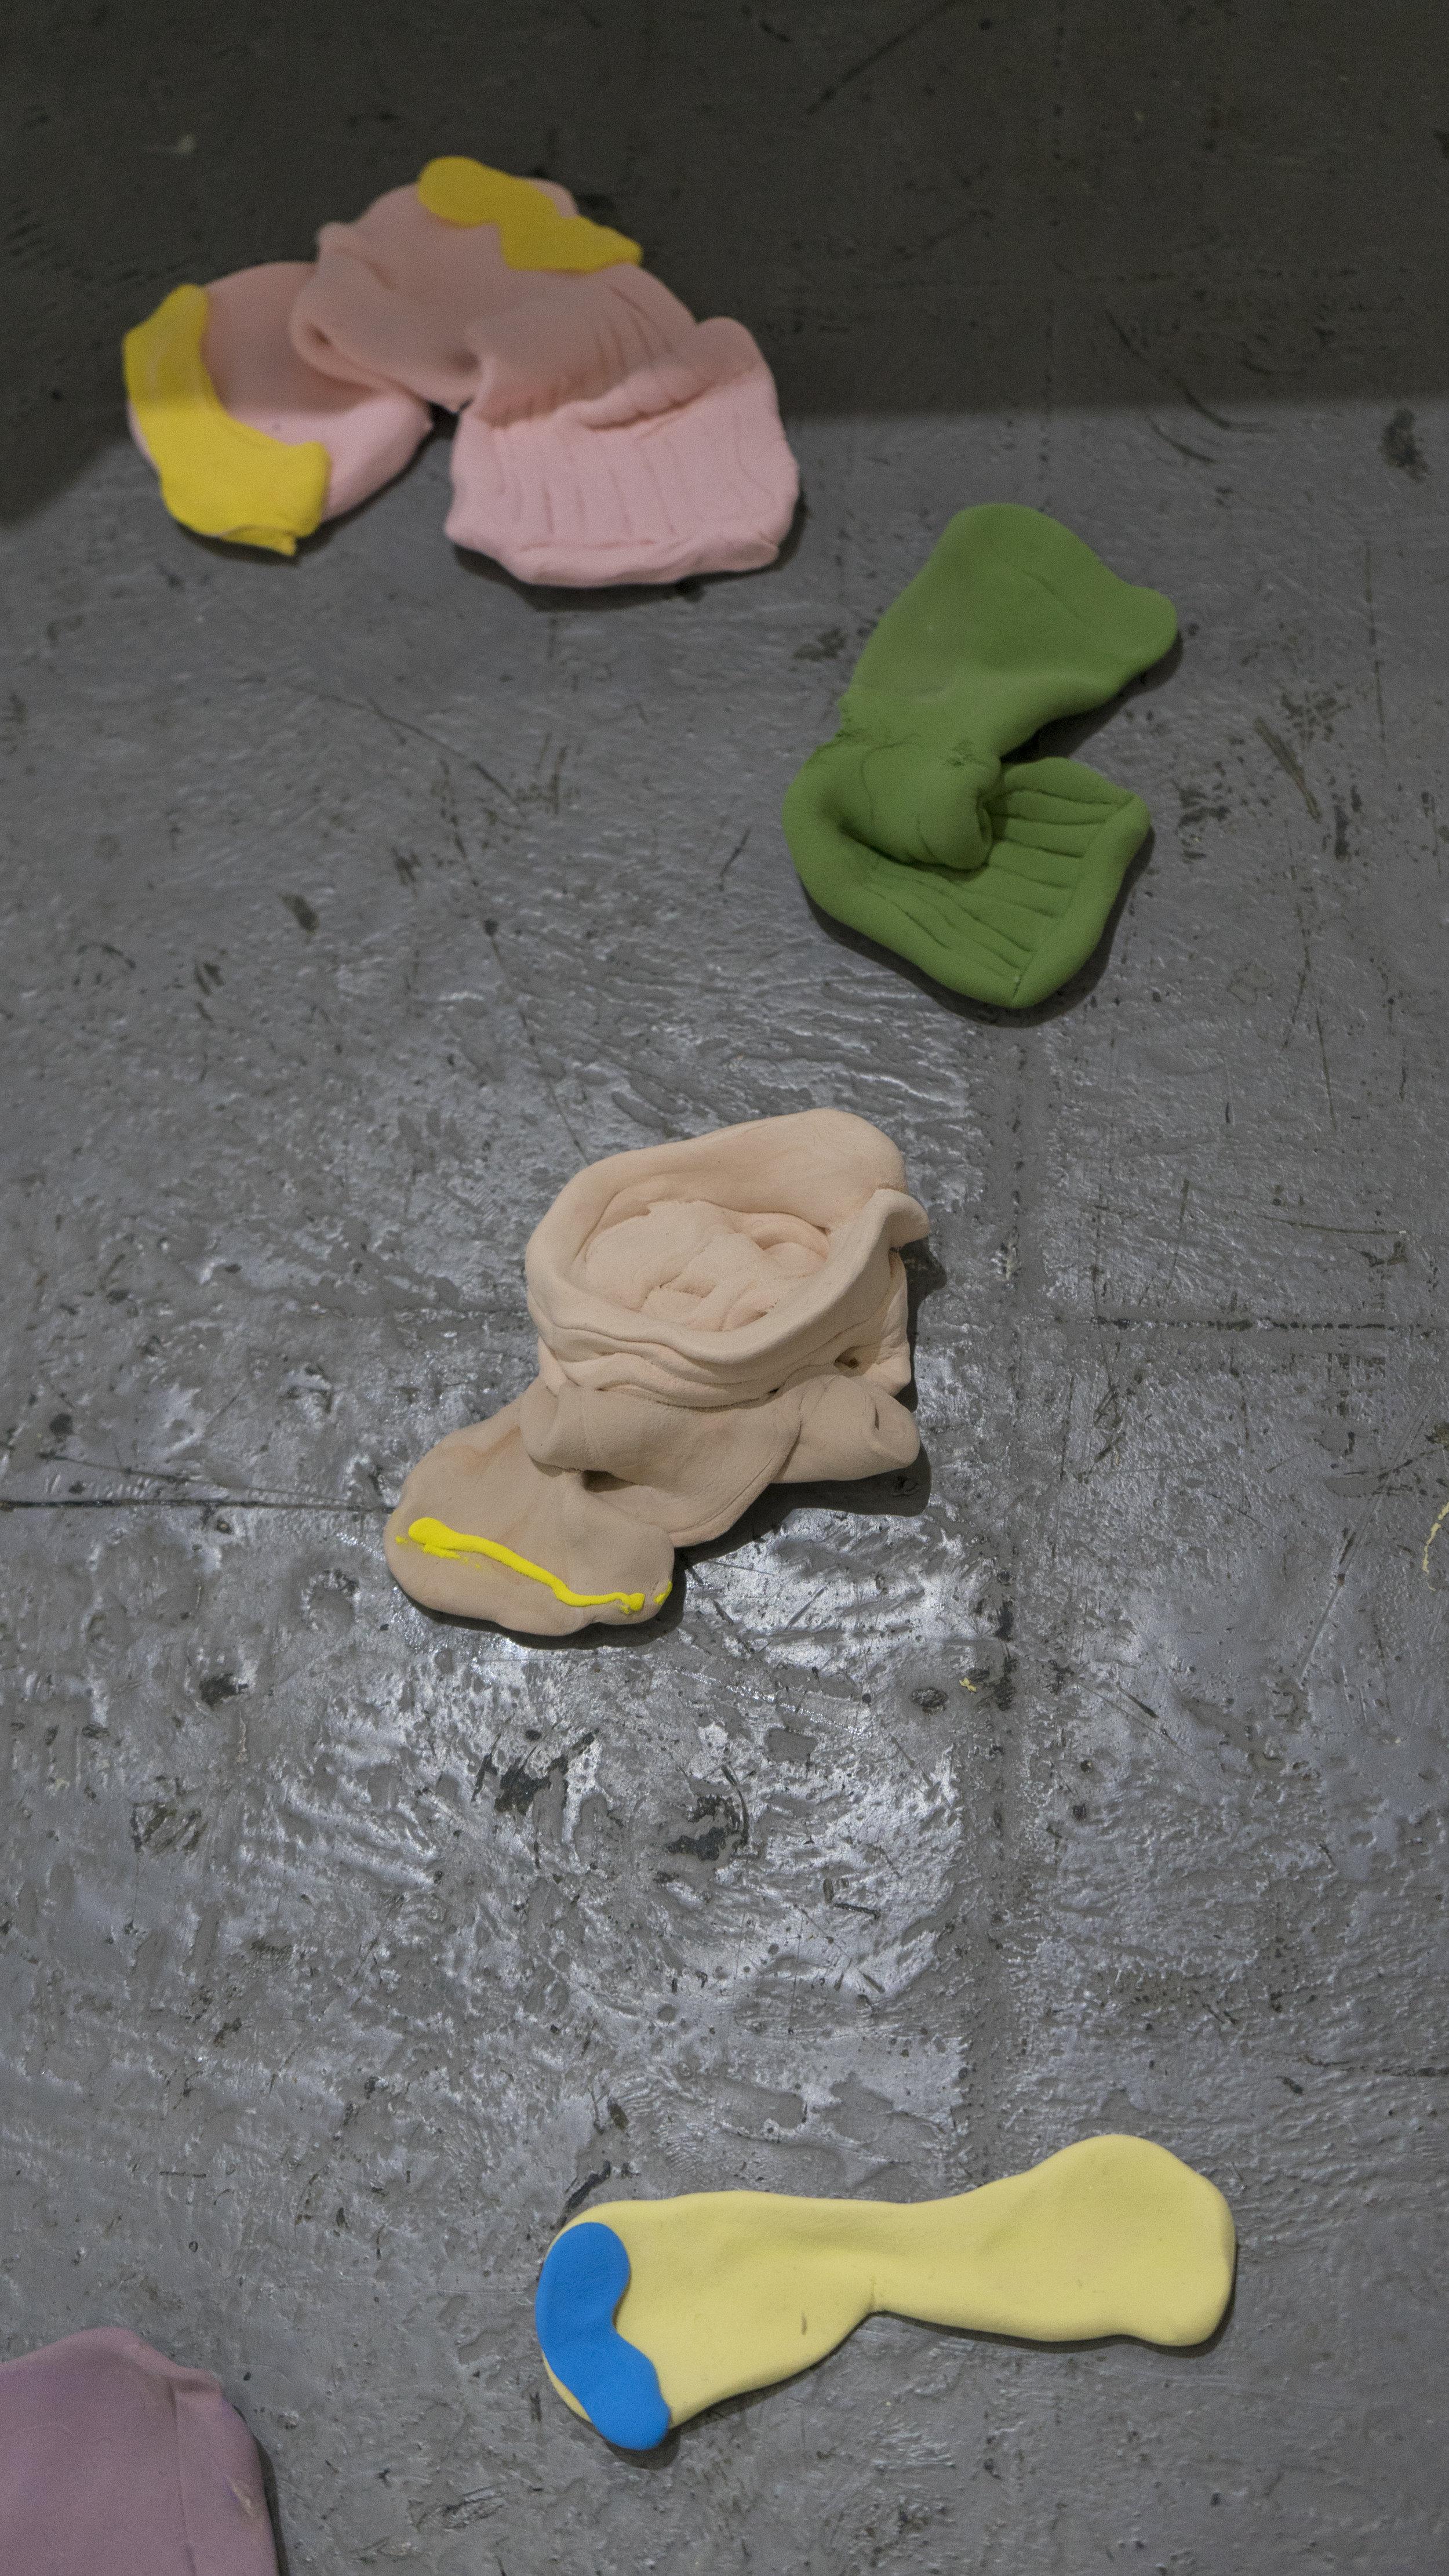 Kitchen table - floor - bed - socks   Bridget Bailey  Air dry clay  2017